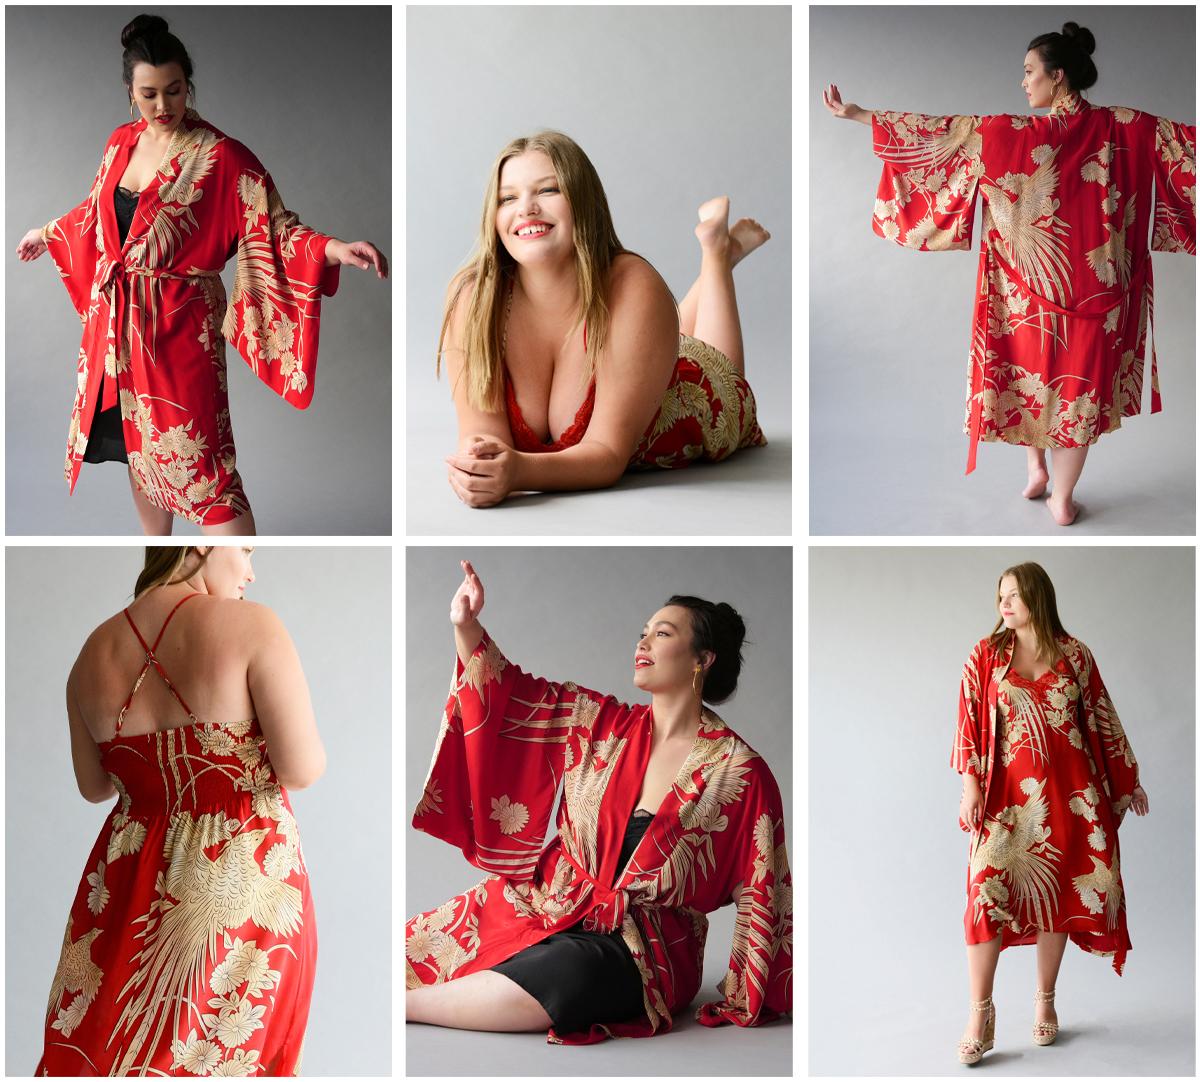 test Twitter Media - Memoirs of a Geisha - Silk Kimono and slip dress by #annascholz #plussizedesigner https://t.co/RBjXILdAhX https://t.co/sDVakqzCwB